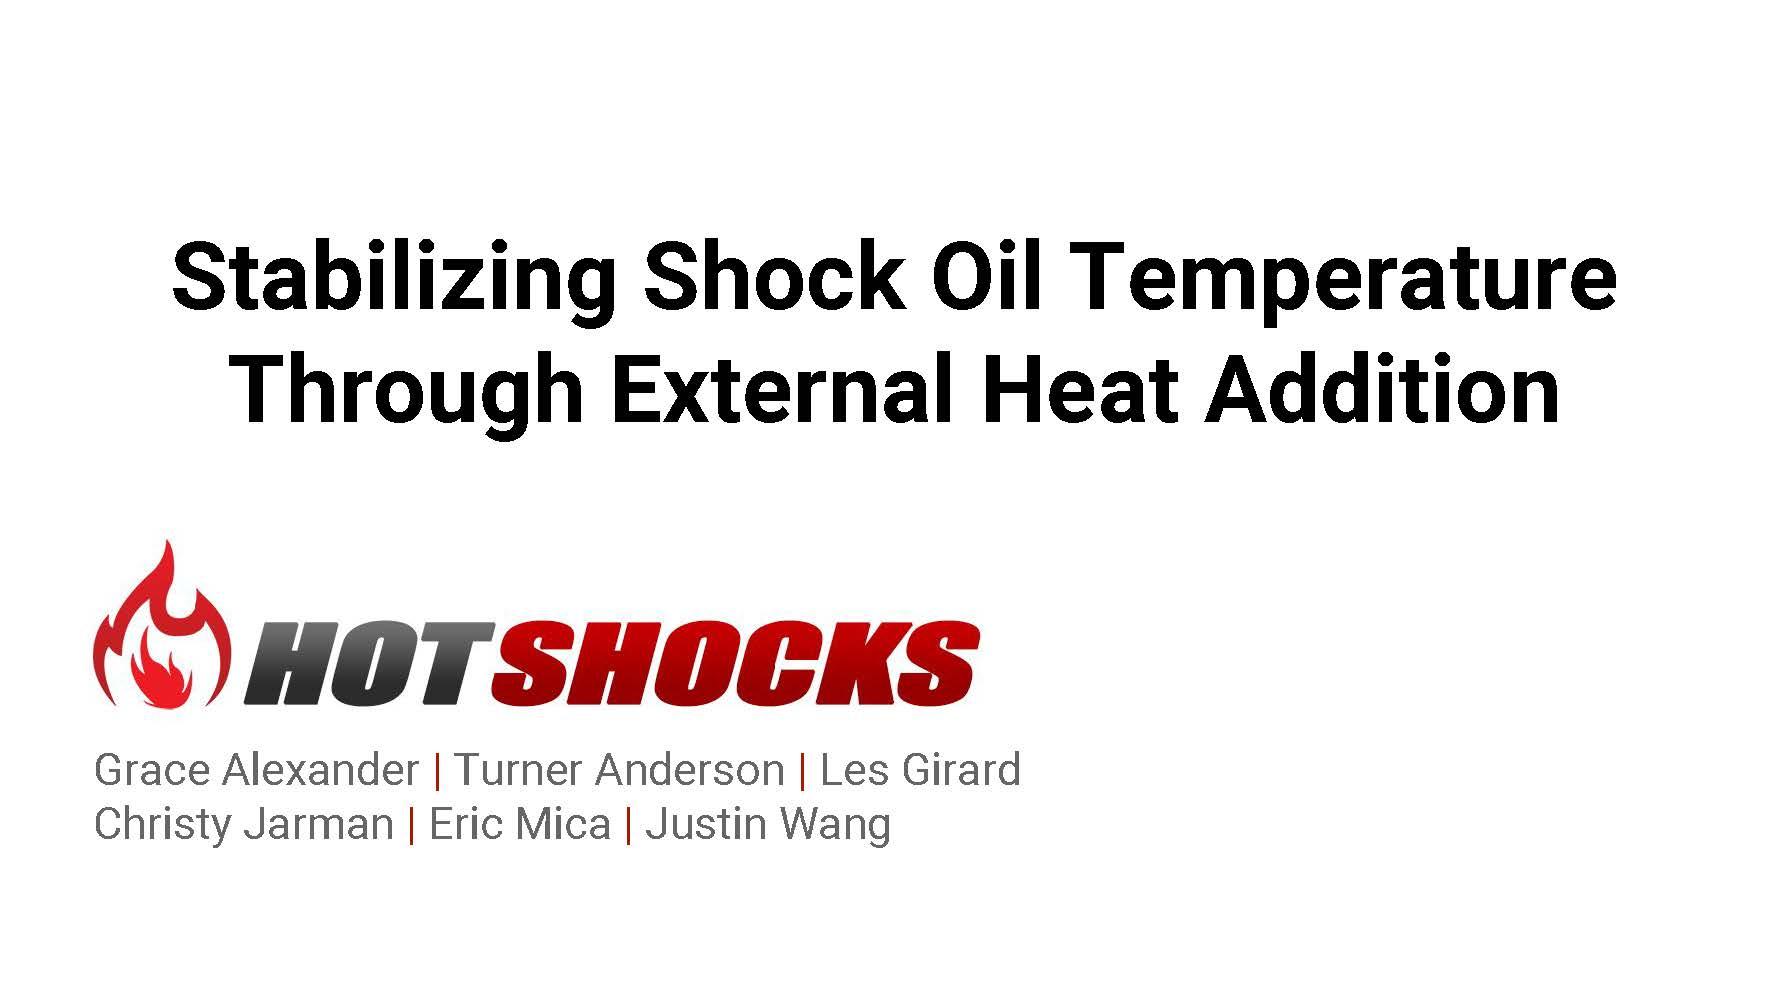 The Hot Shocks -Final Presentation_Page_01.jpg